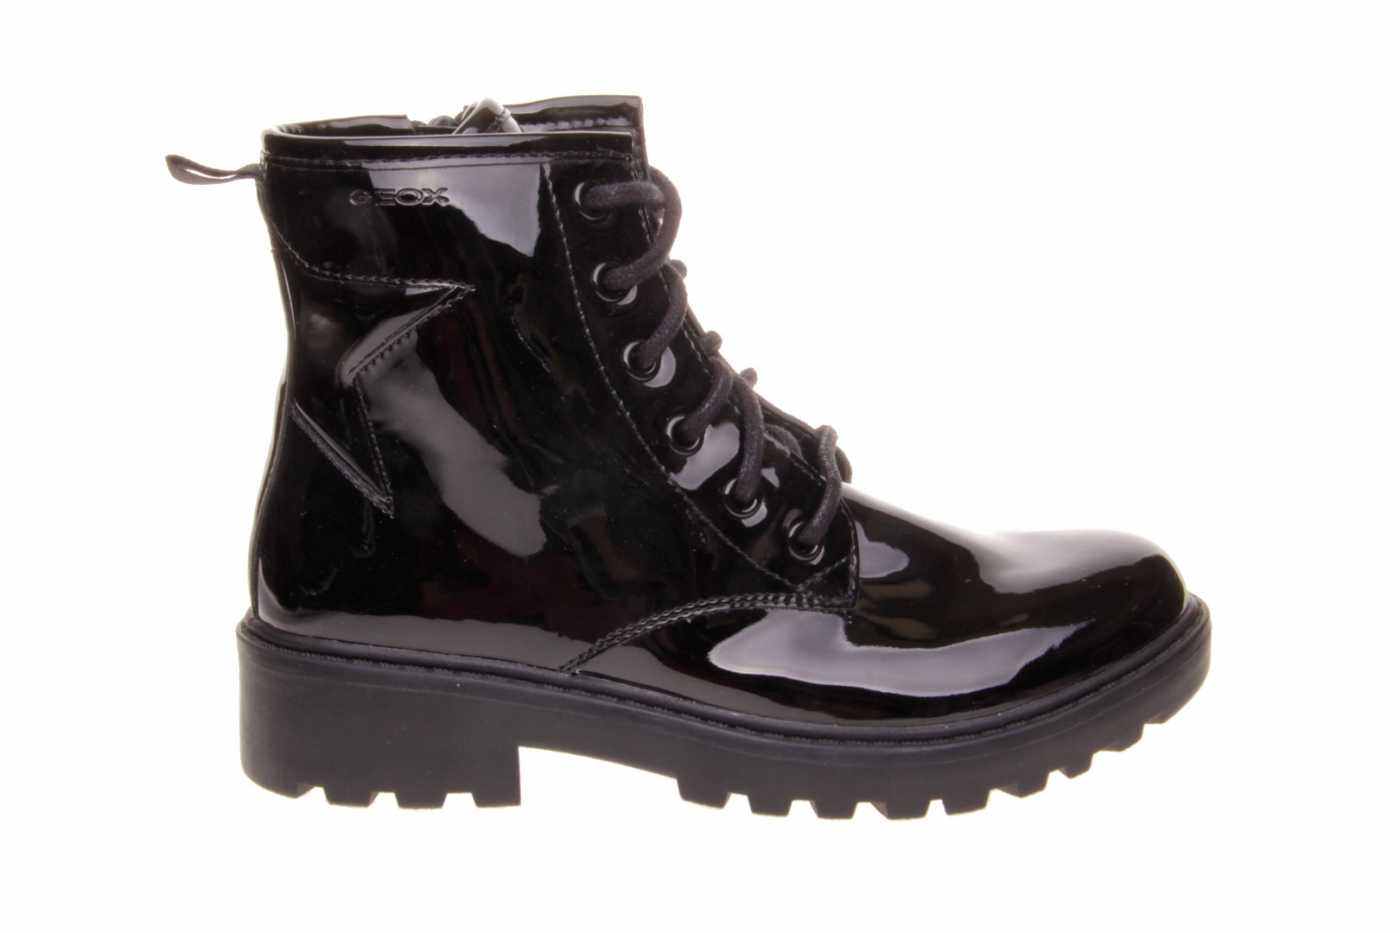 Diariamente Aditivo un millón  Comprar zapato GEOX para JOVEN NIÑA estilo BOTINES-BOTA ALTA color NEGRO  CHAROL